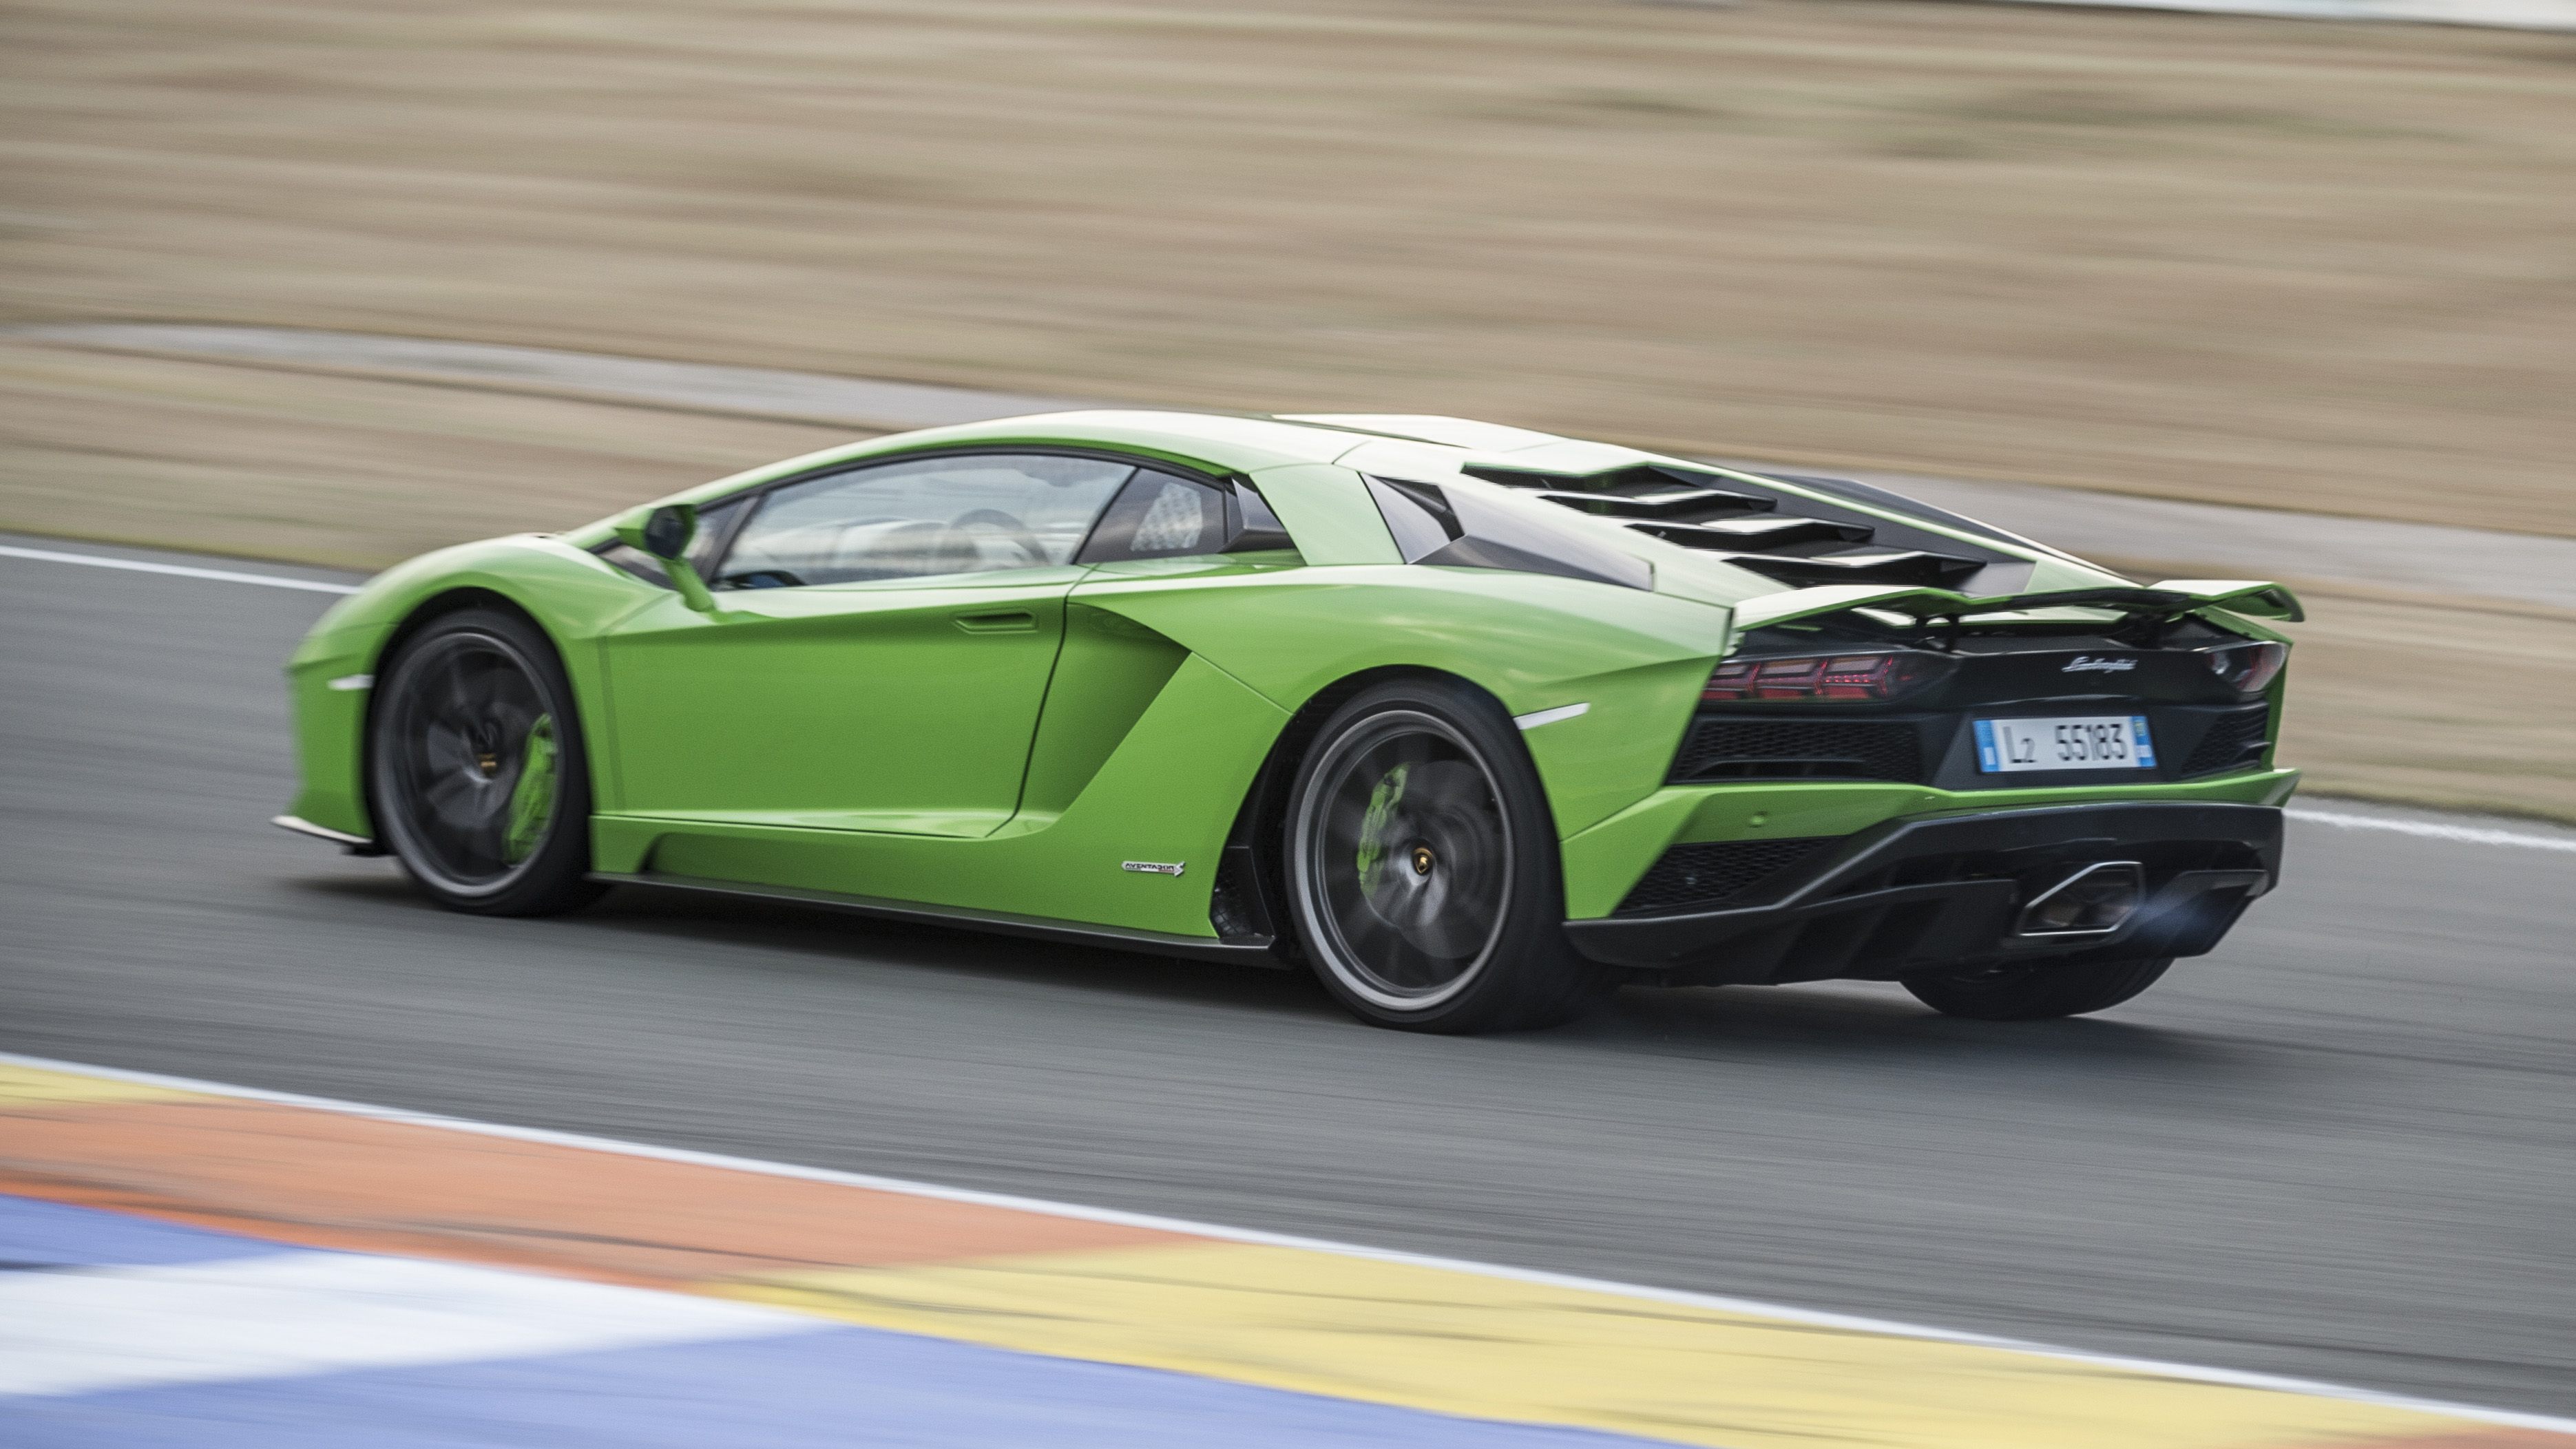 Lamborghini Aventador S rear quarter